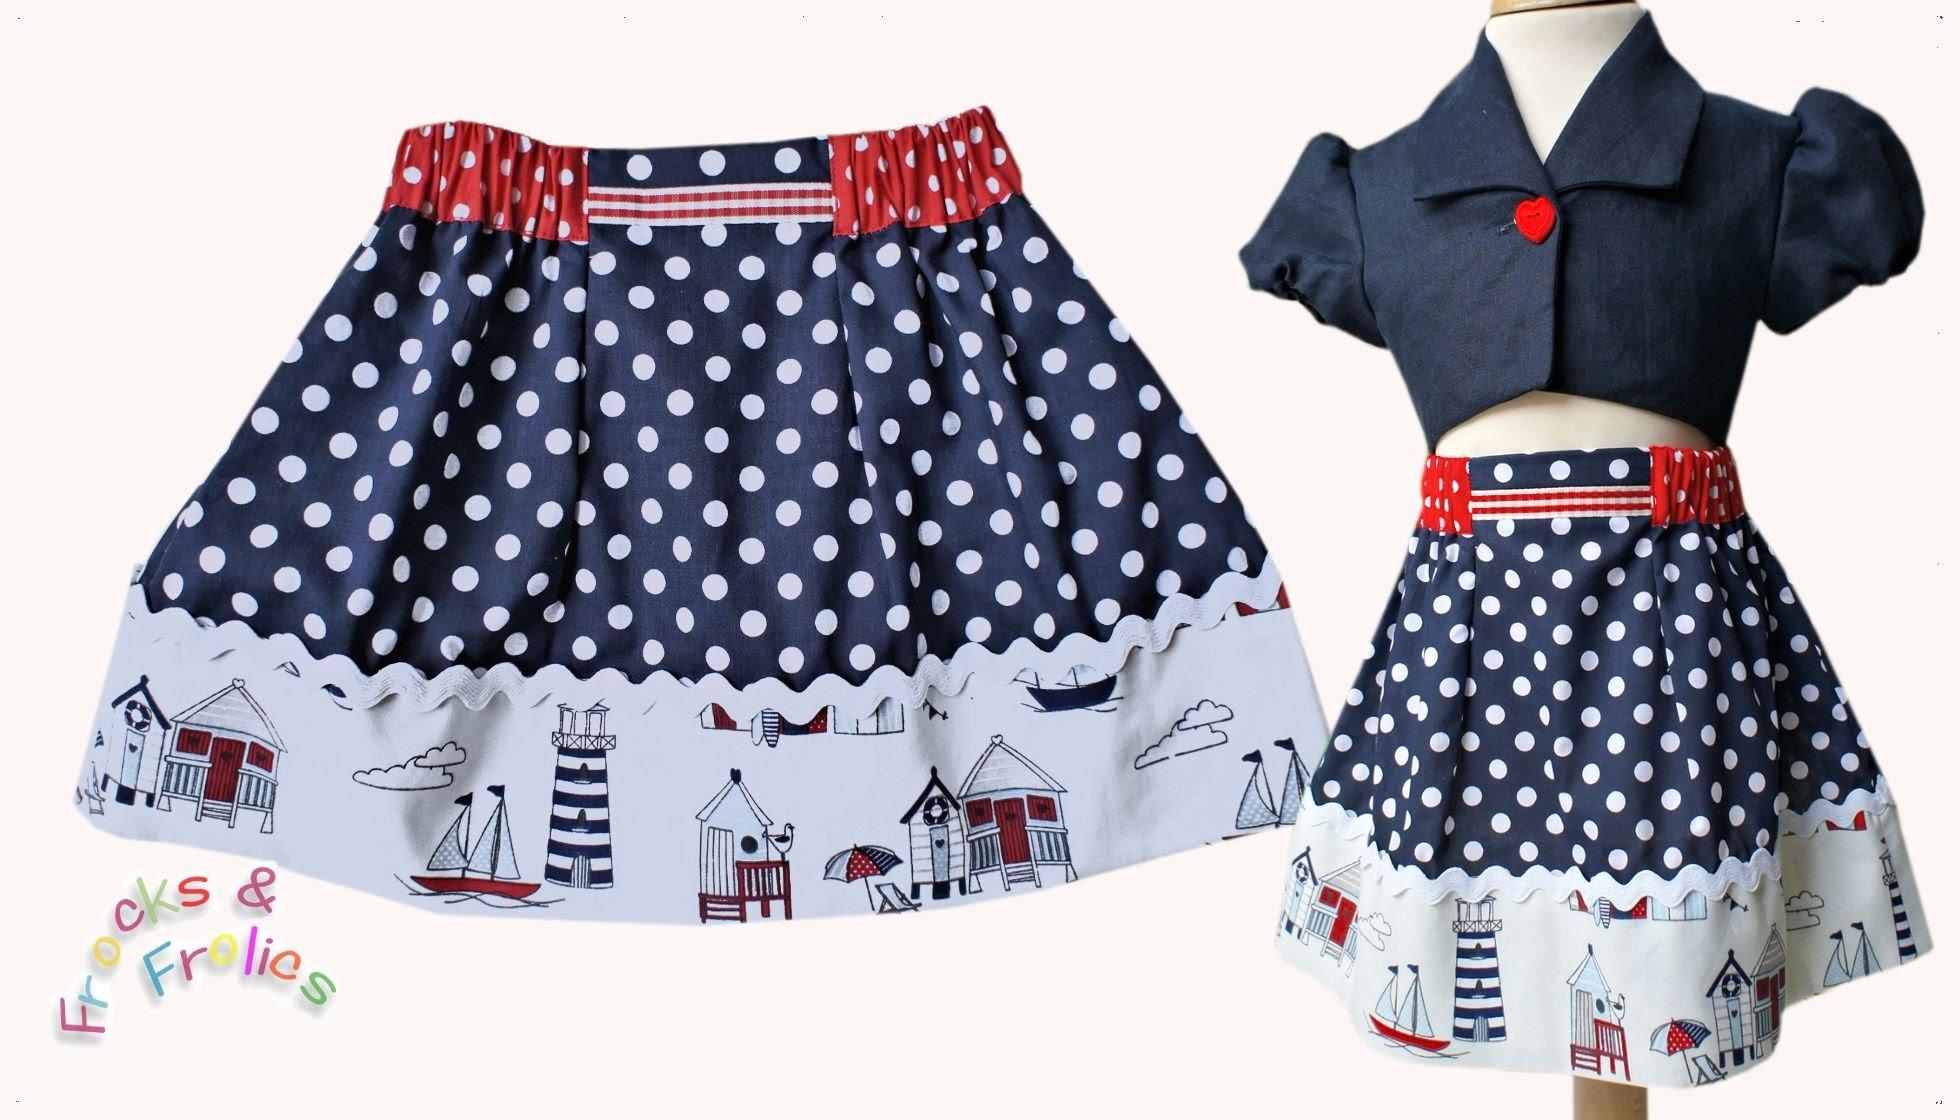 How to sew a skirt  (Easy Summer Skirt Pattern)